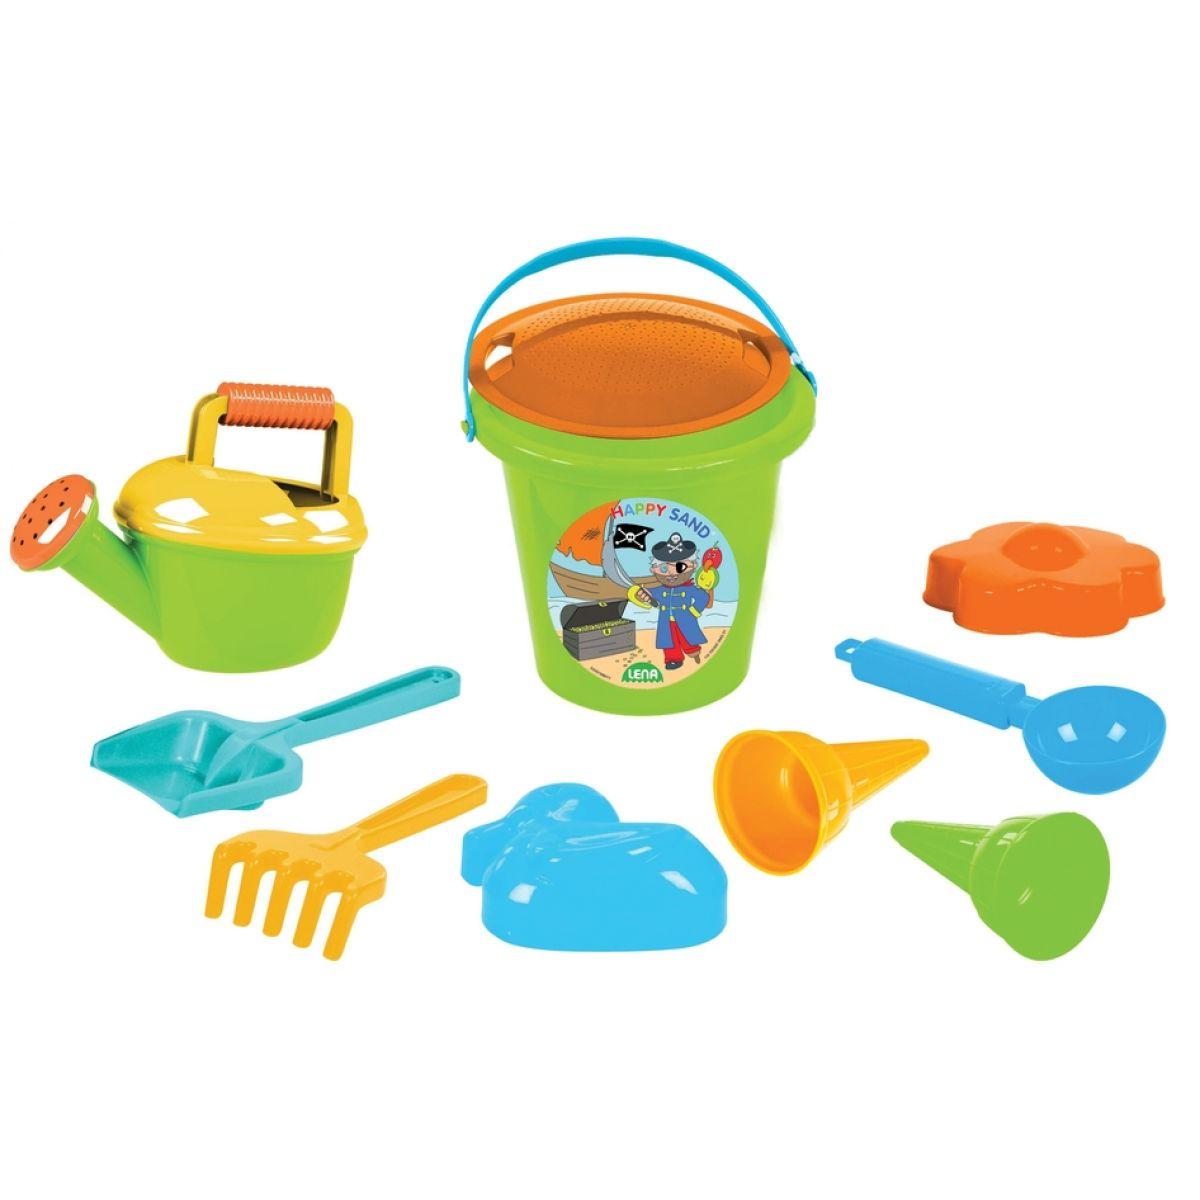 LENA hračky sada na písek pro kluky II 10 dílná